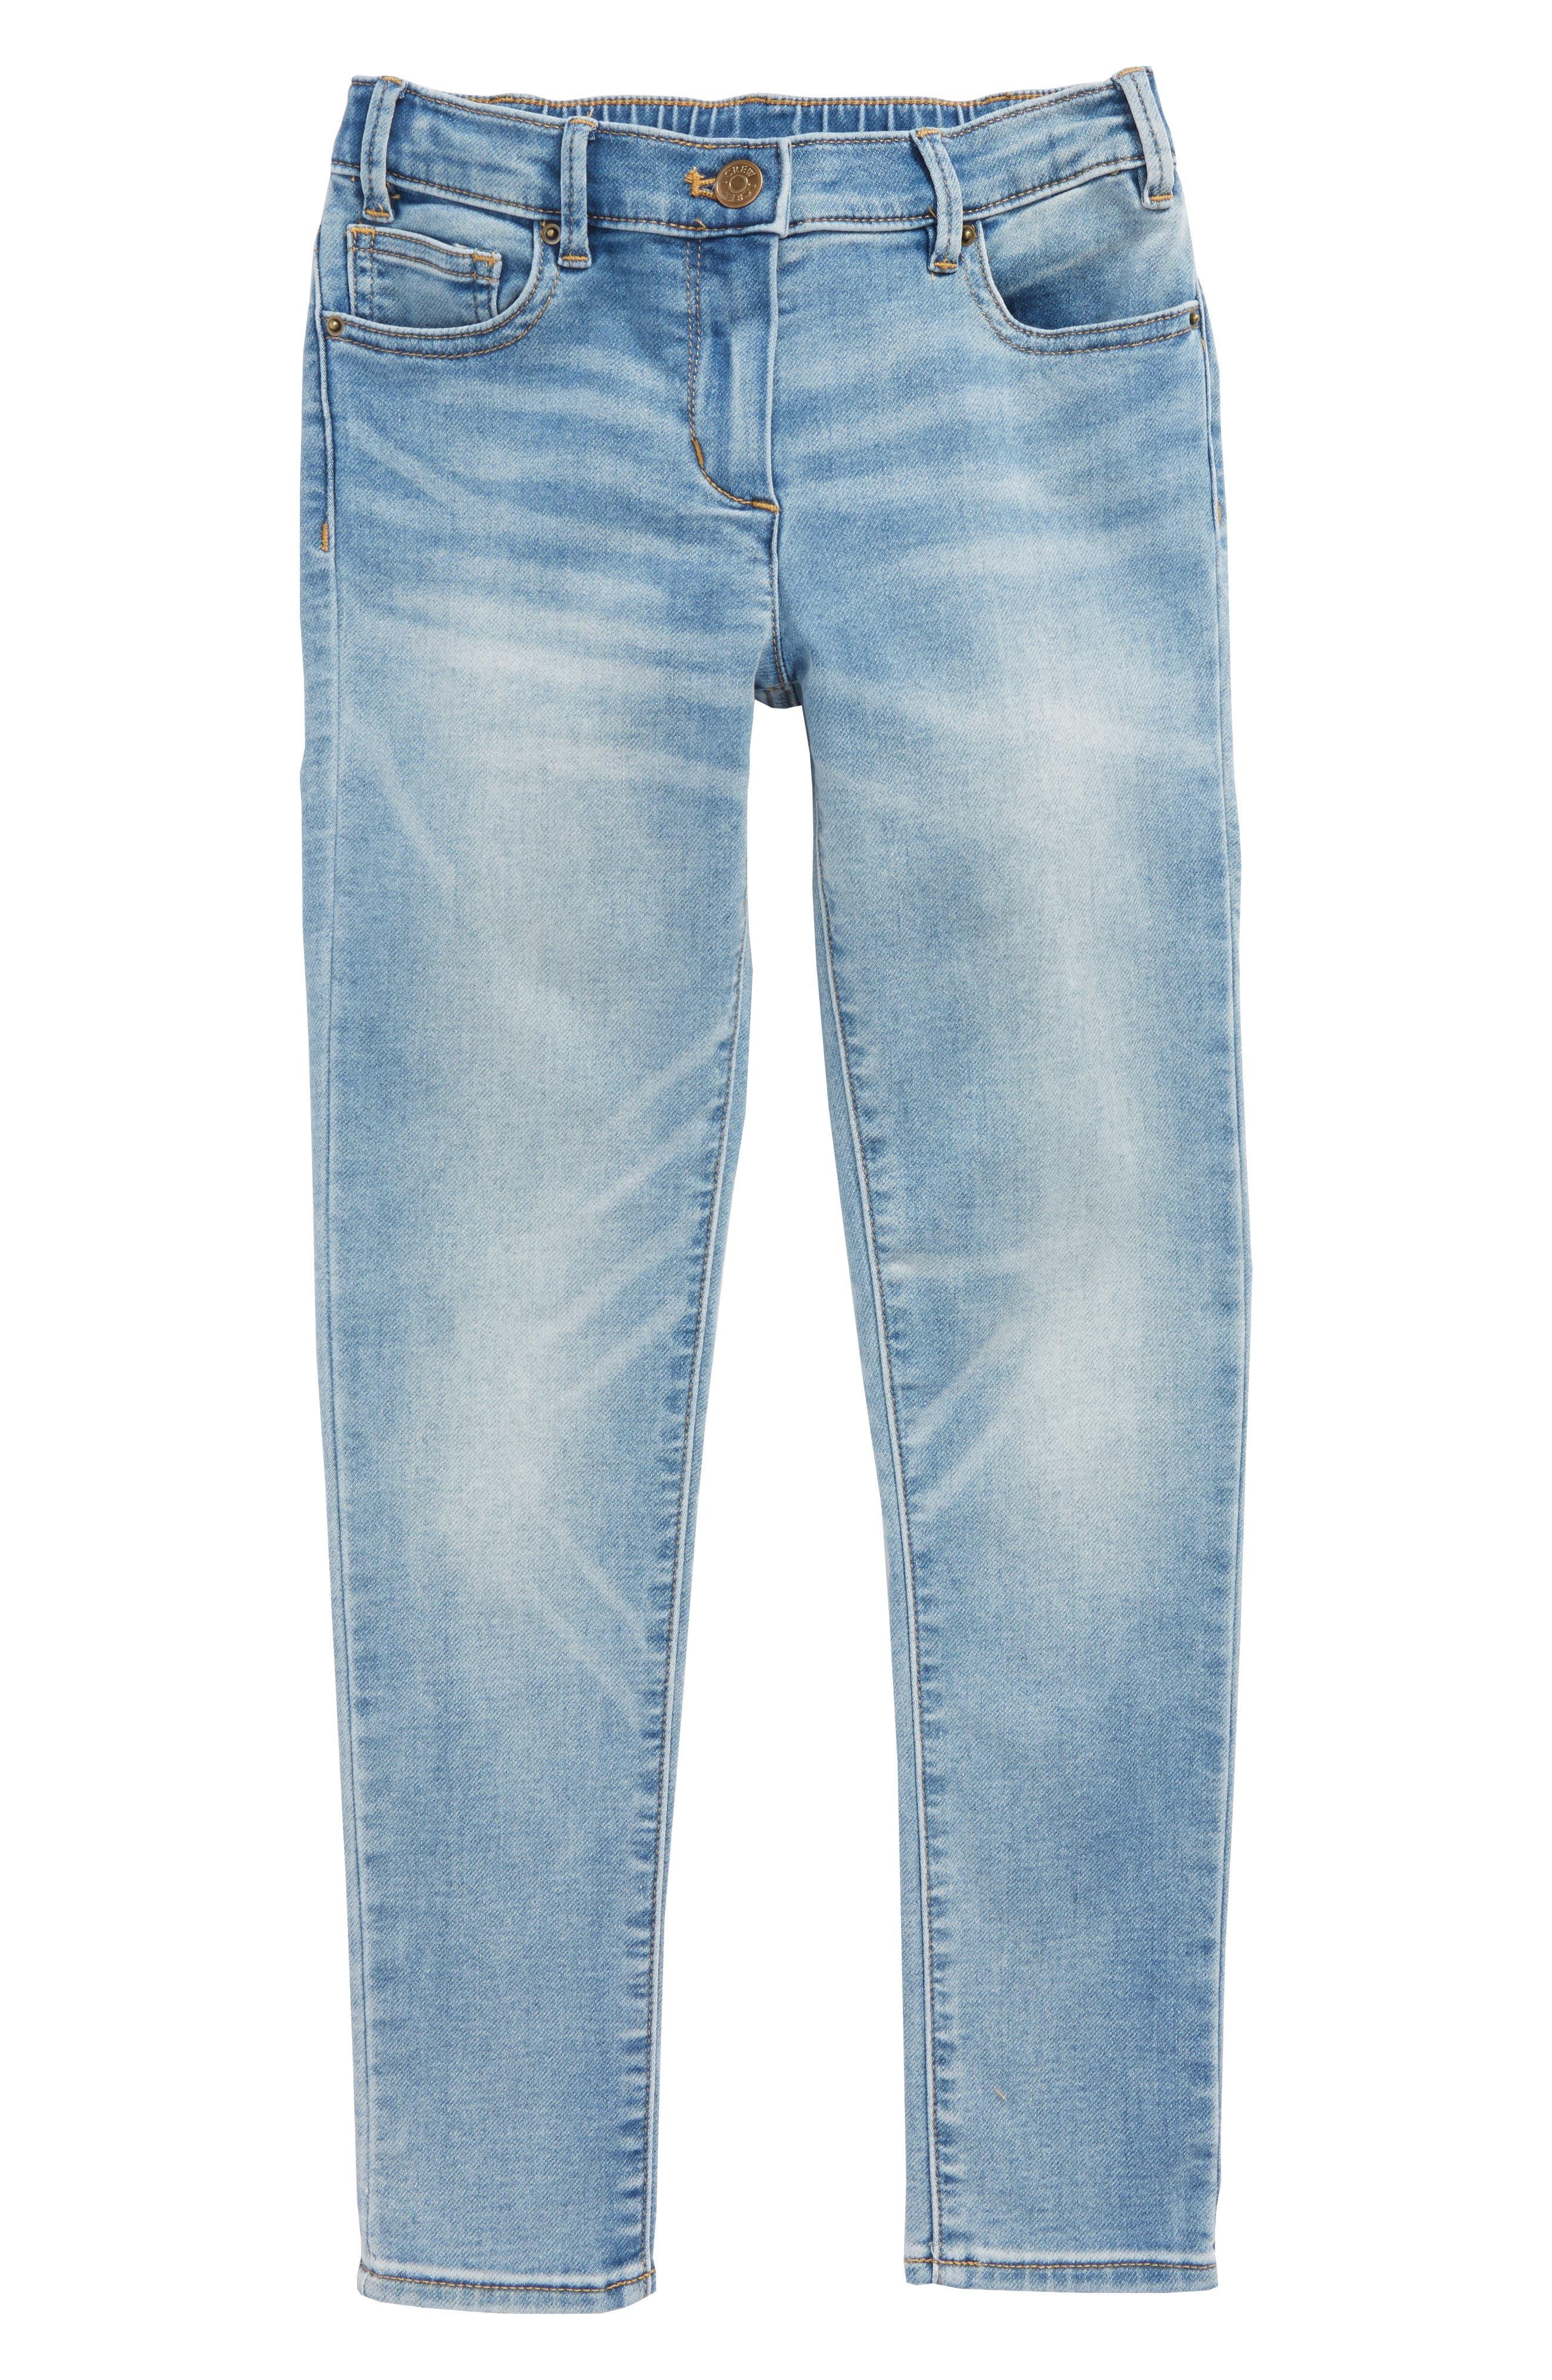 Runaround Stretch Denim Jeans,                             Main thumbnail 1, color,                             PATCHWORK WASH